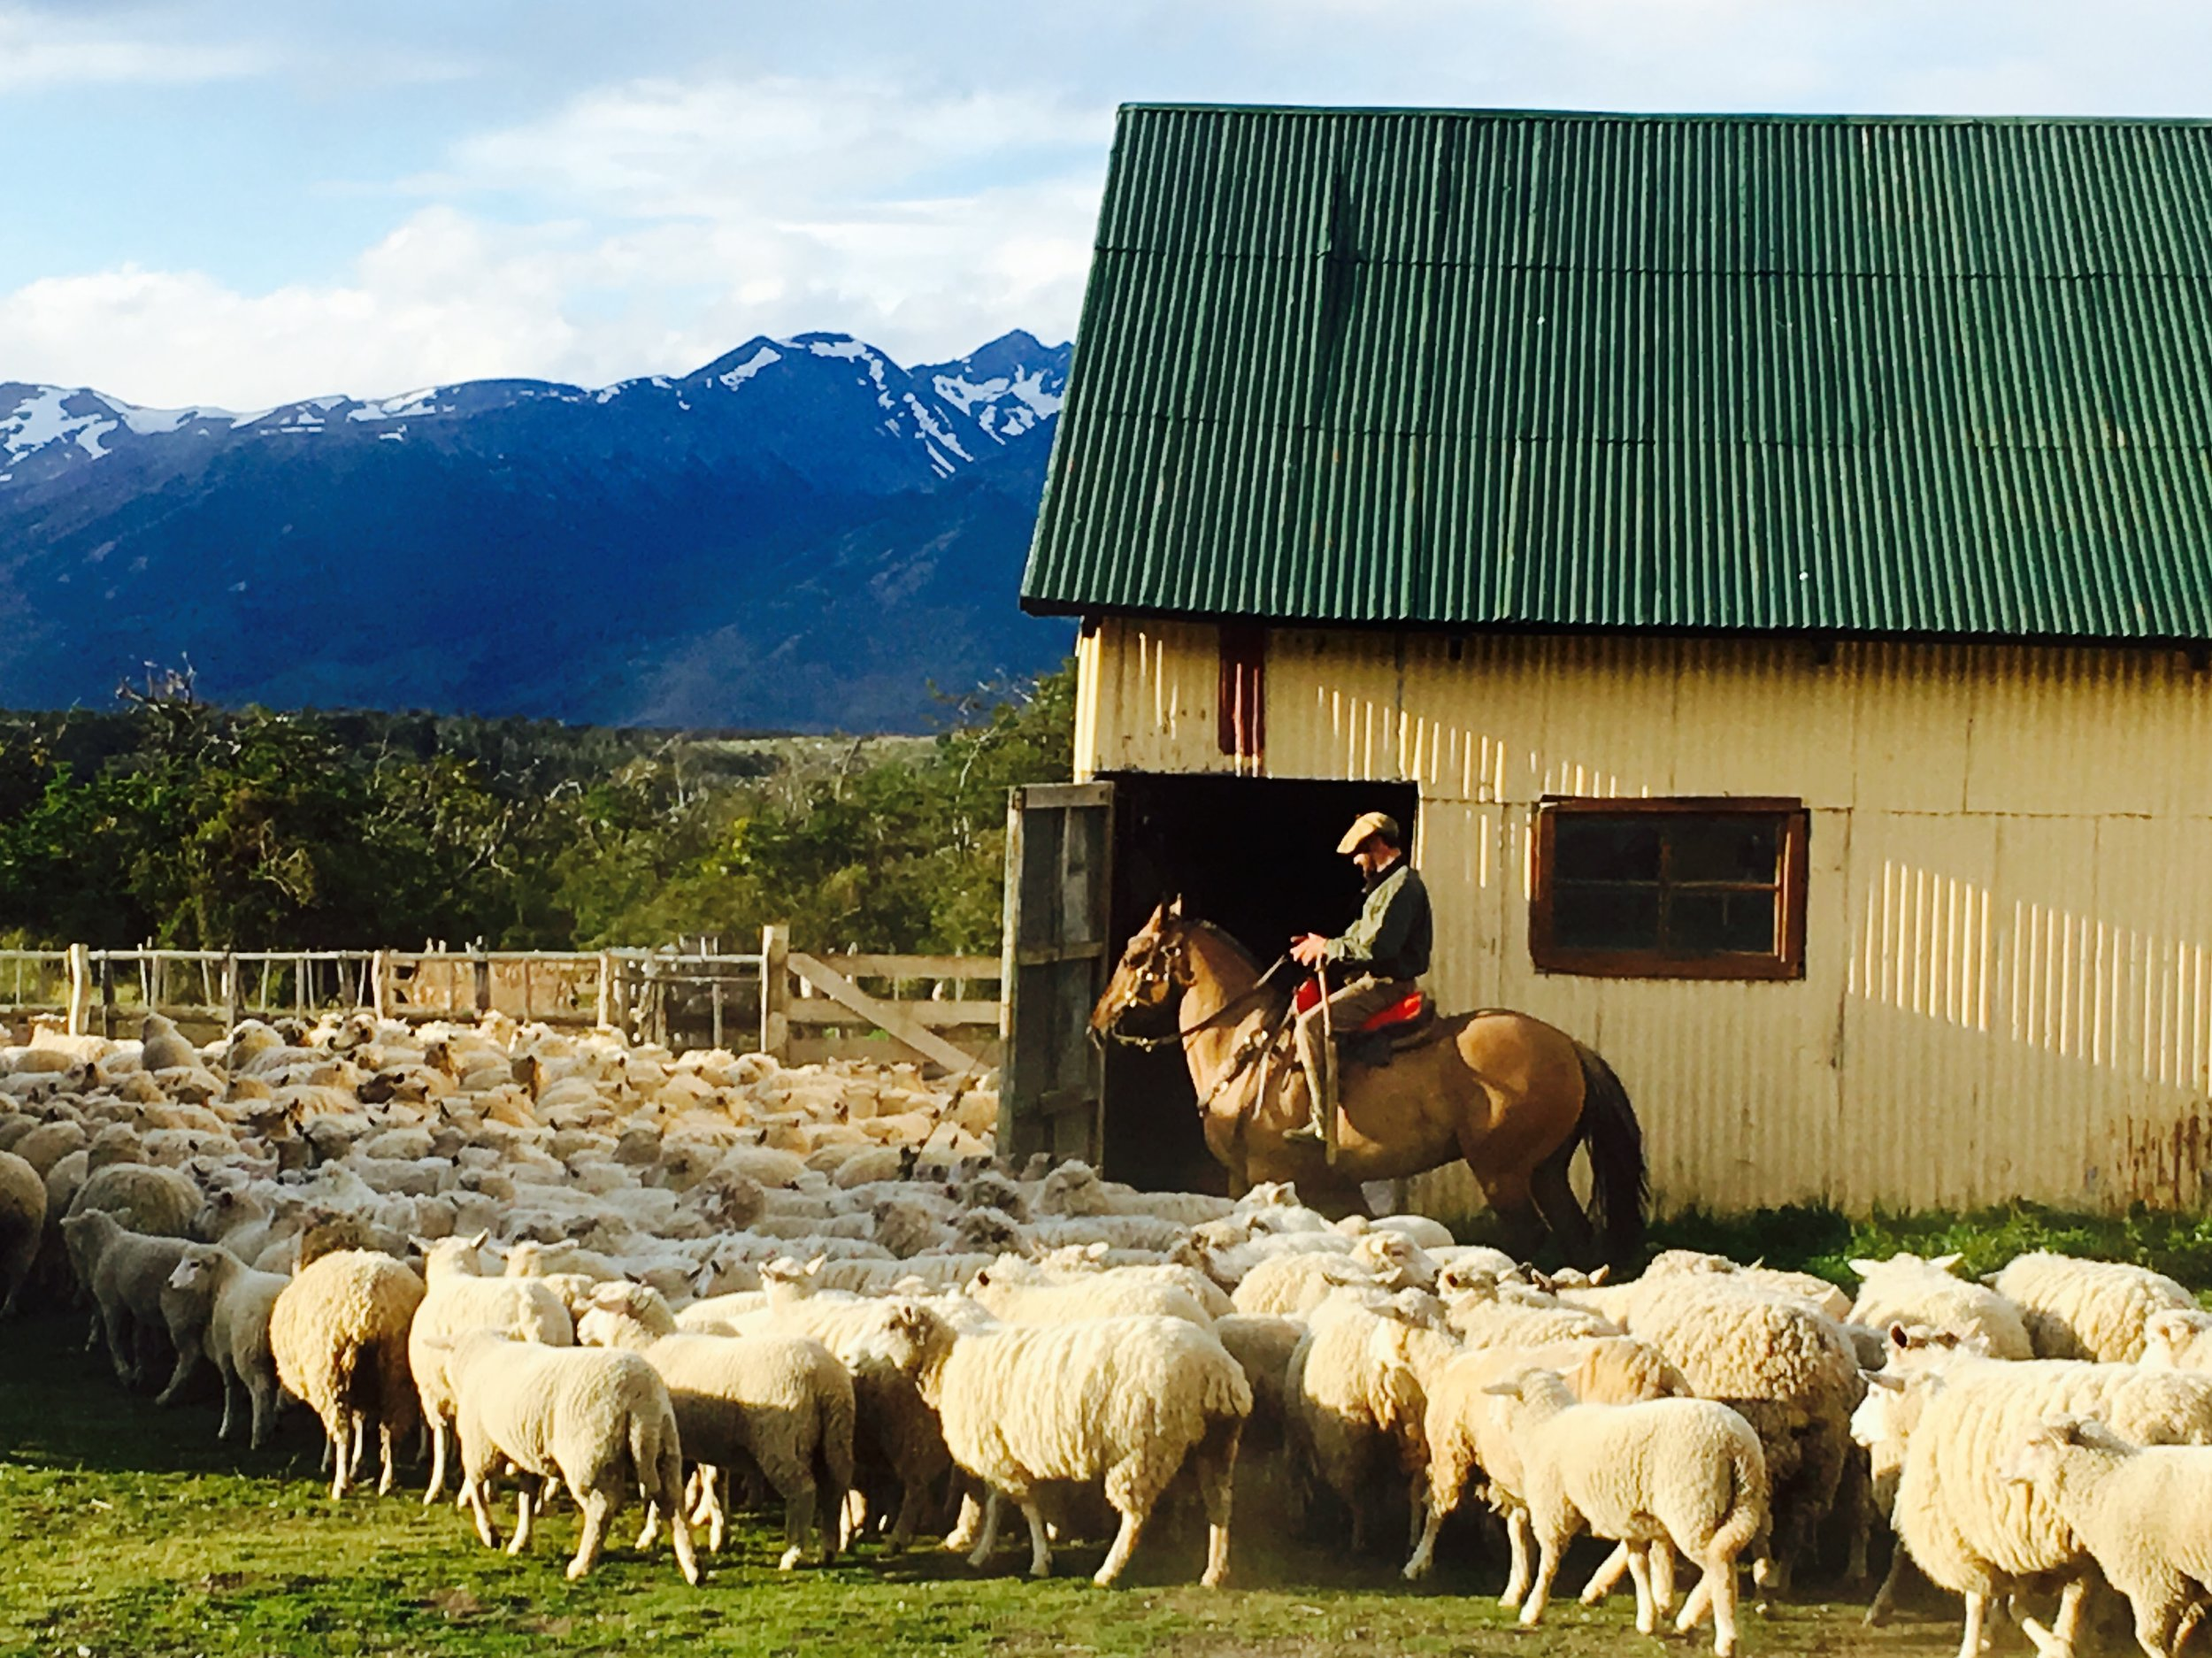 Estancia Nibepo Aike, Patagonia, Argentina